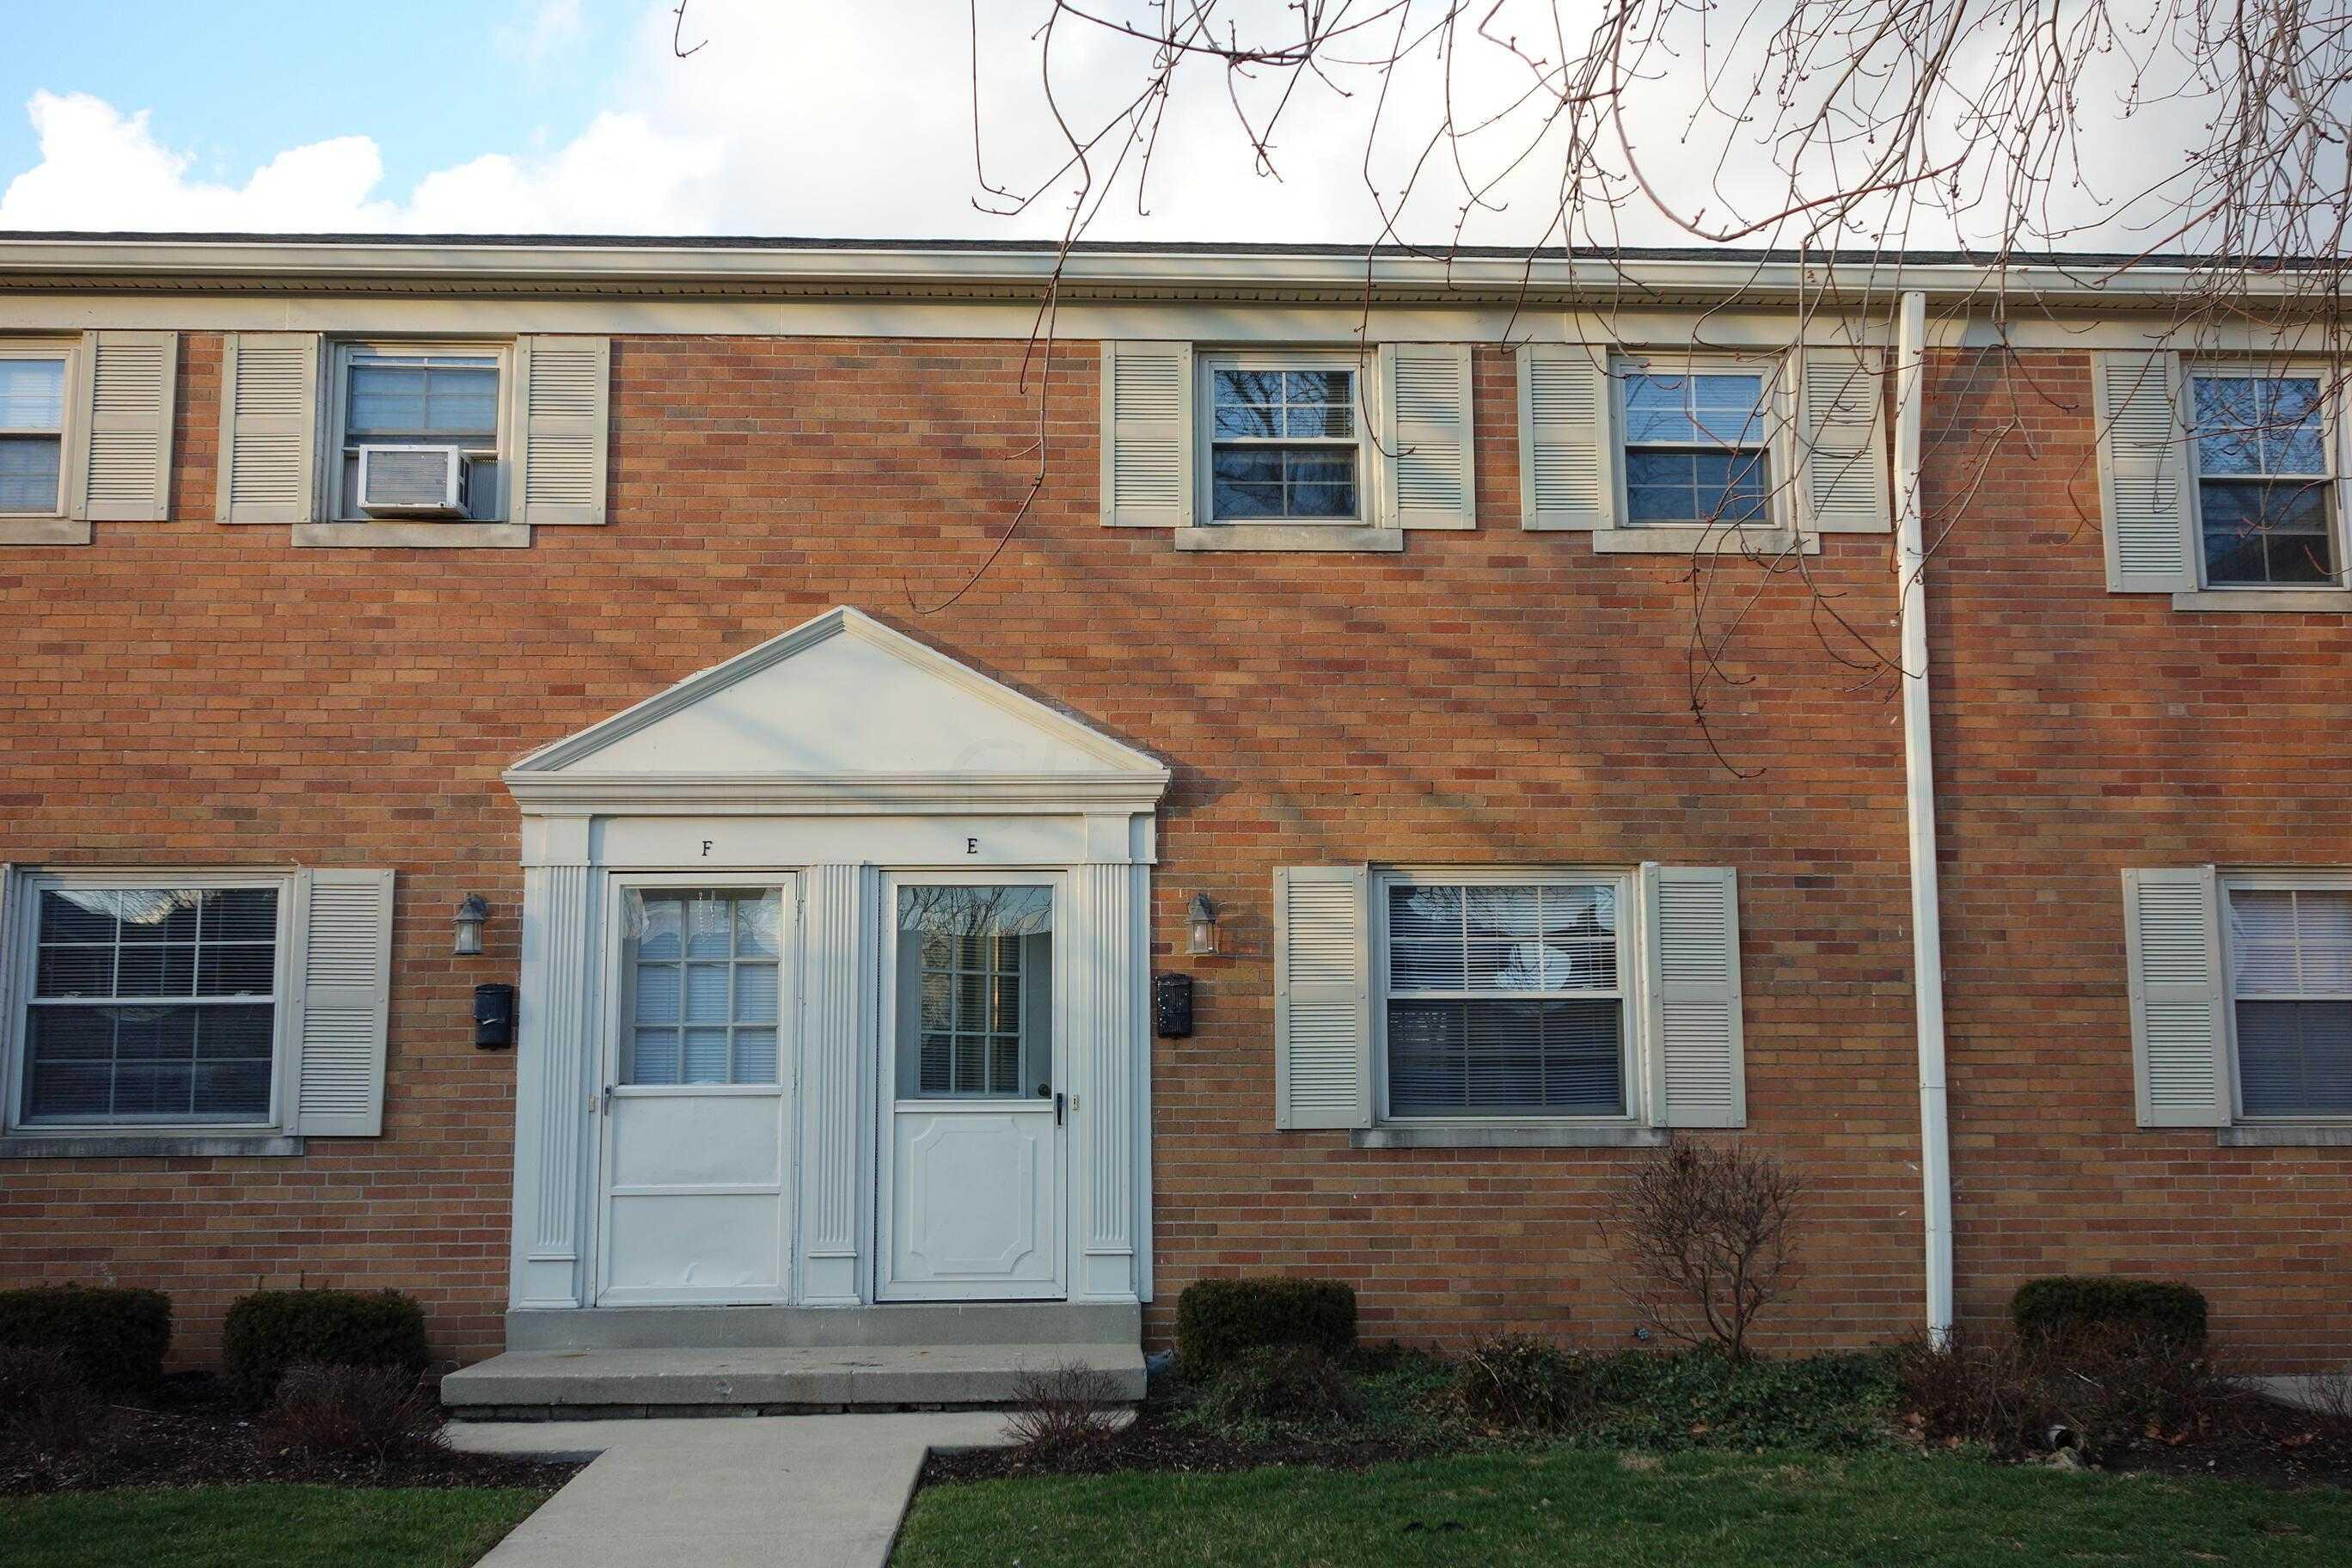 1060 Sells Avenue Unit 101 Columbus,OH 43212 221000772